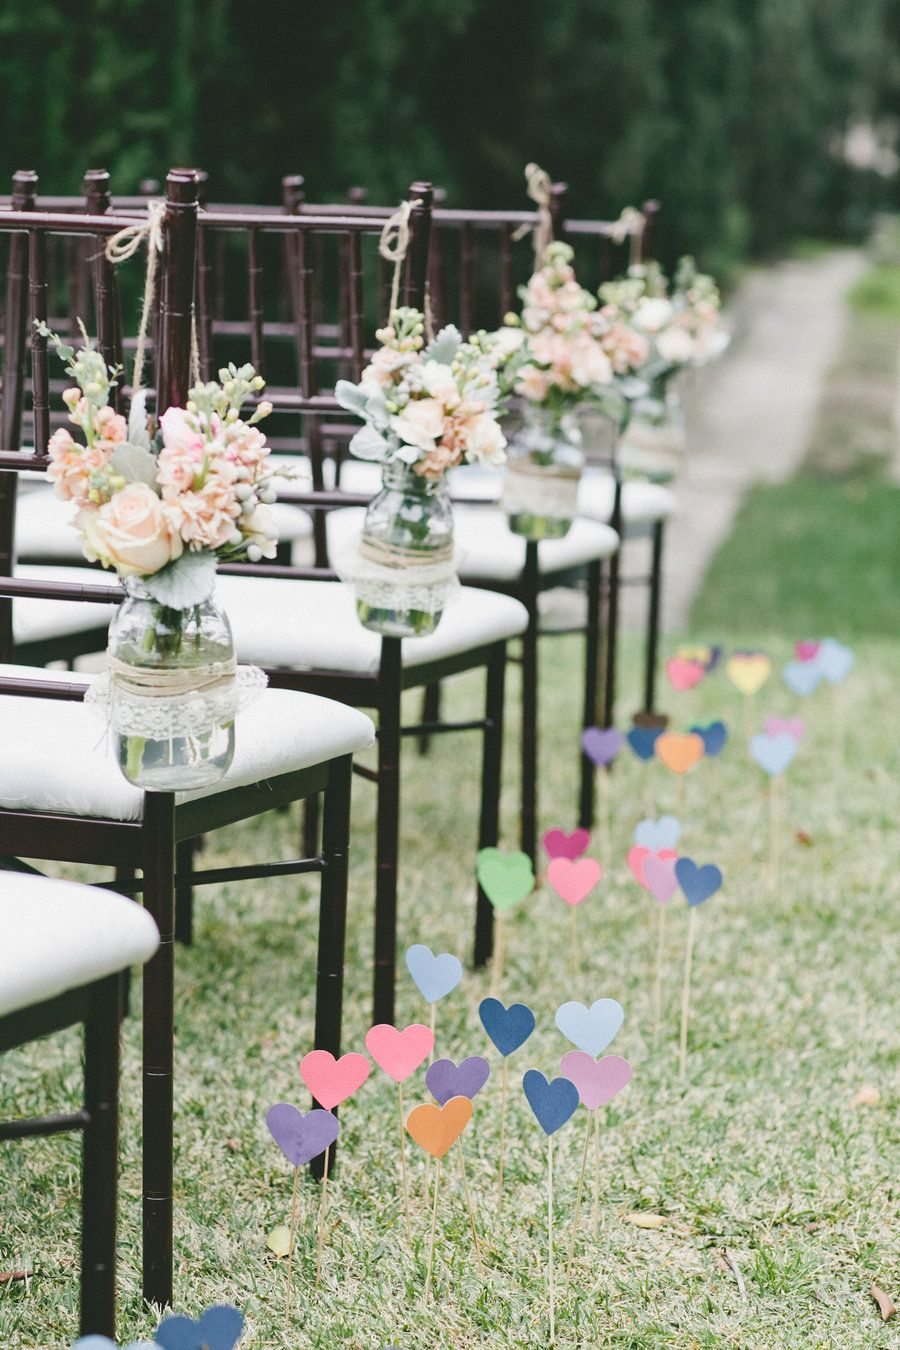 Wedding chair decorations diy  Wedding ceremony chair decorations diy mason jars  When I tie the